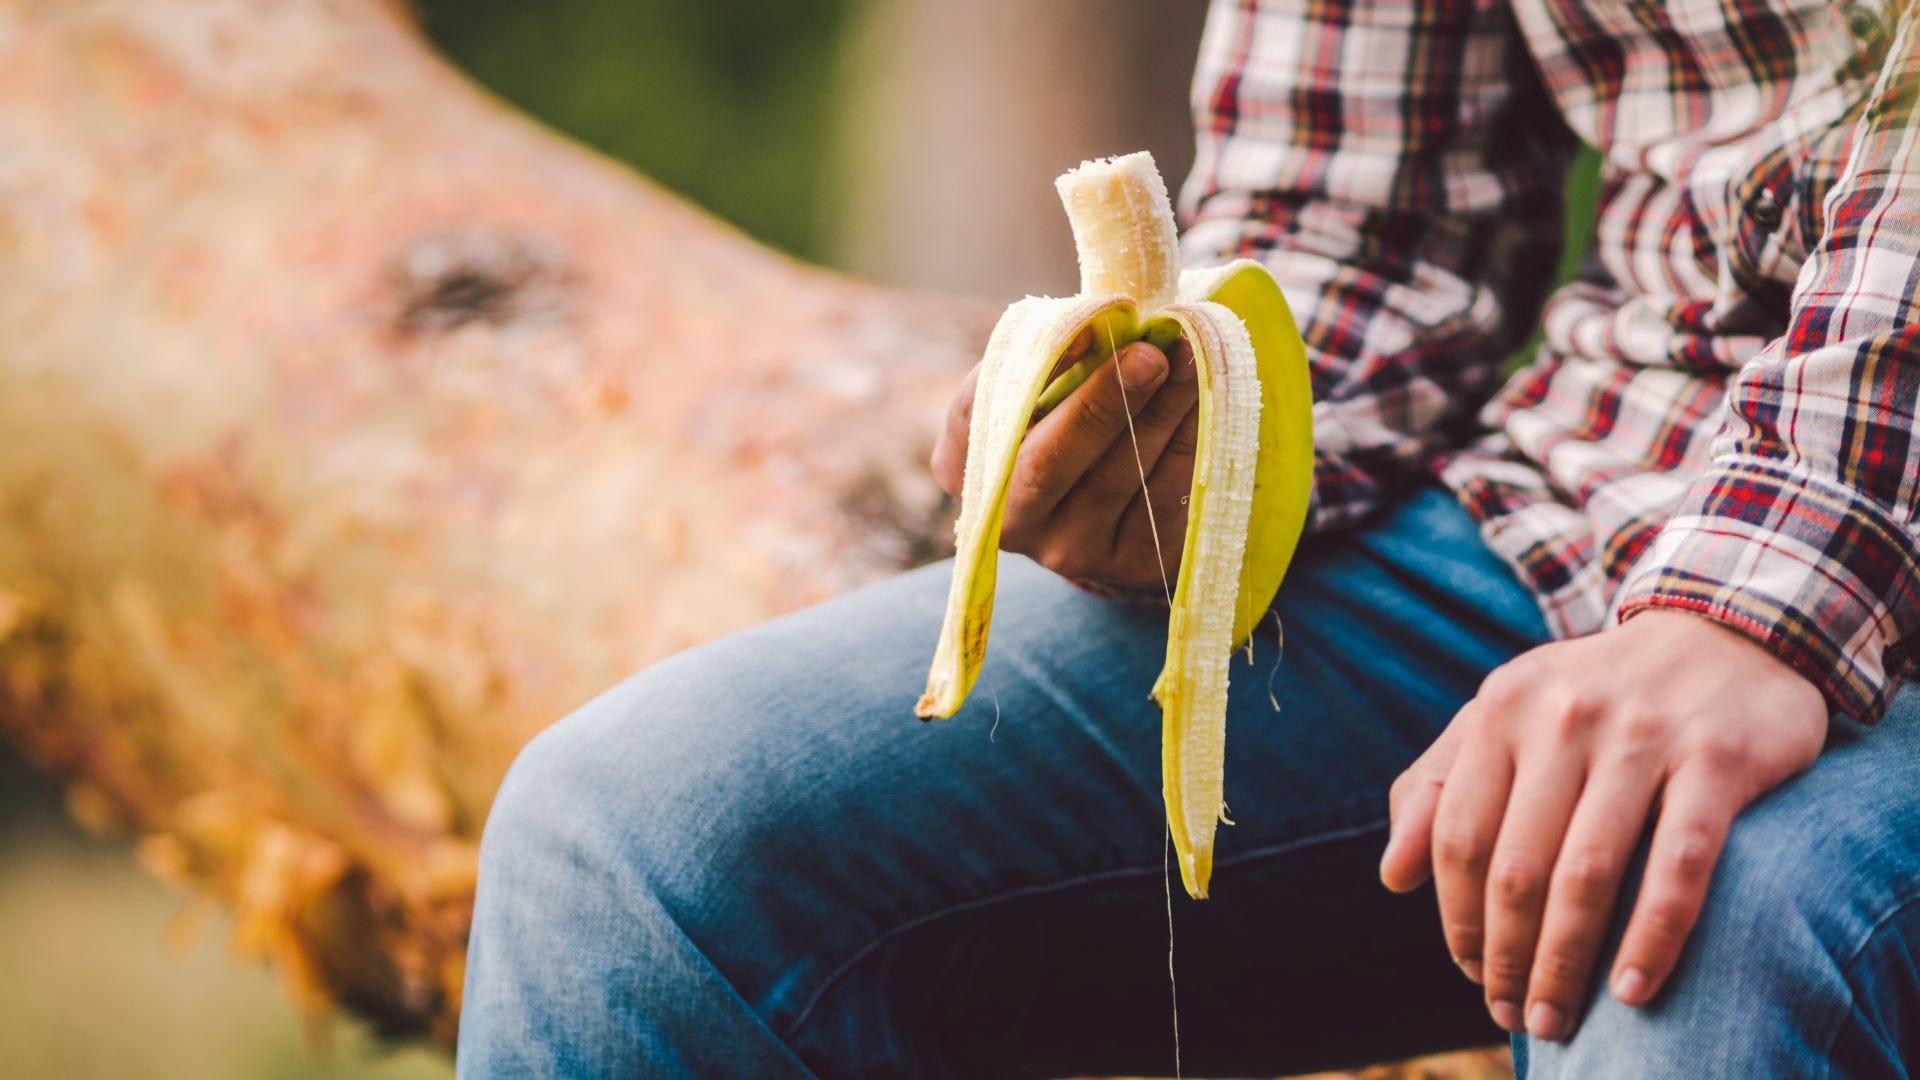 Man eating a banana on a hike.